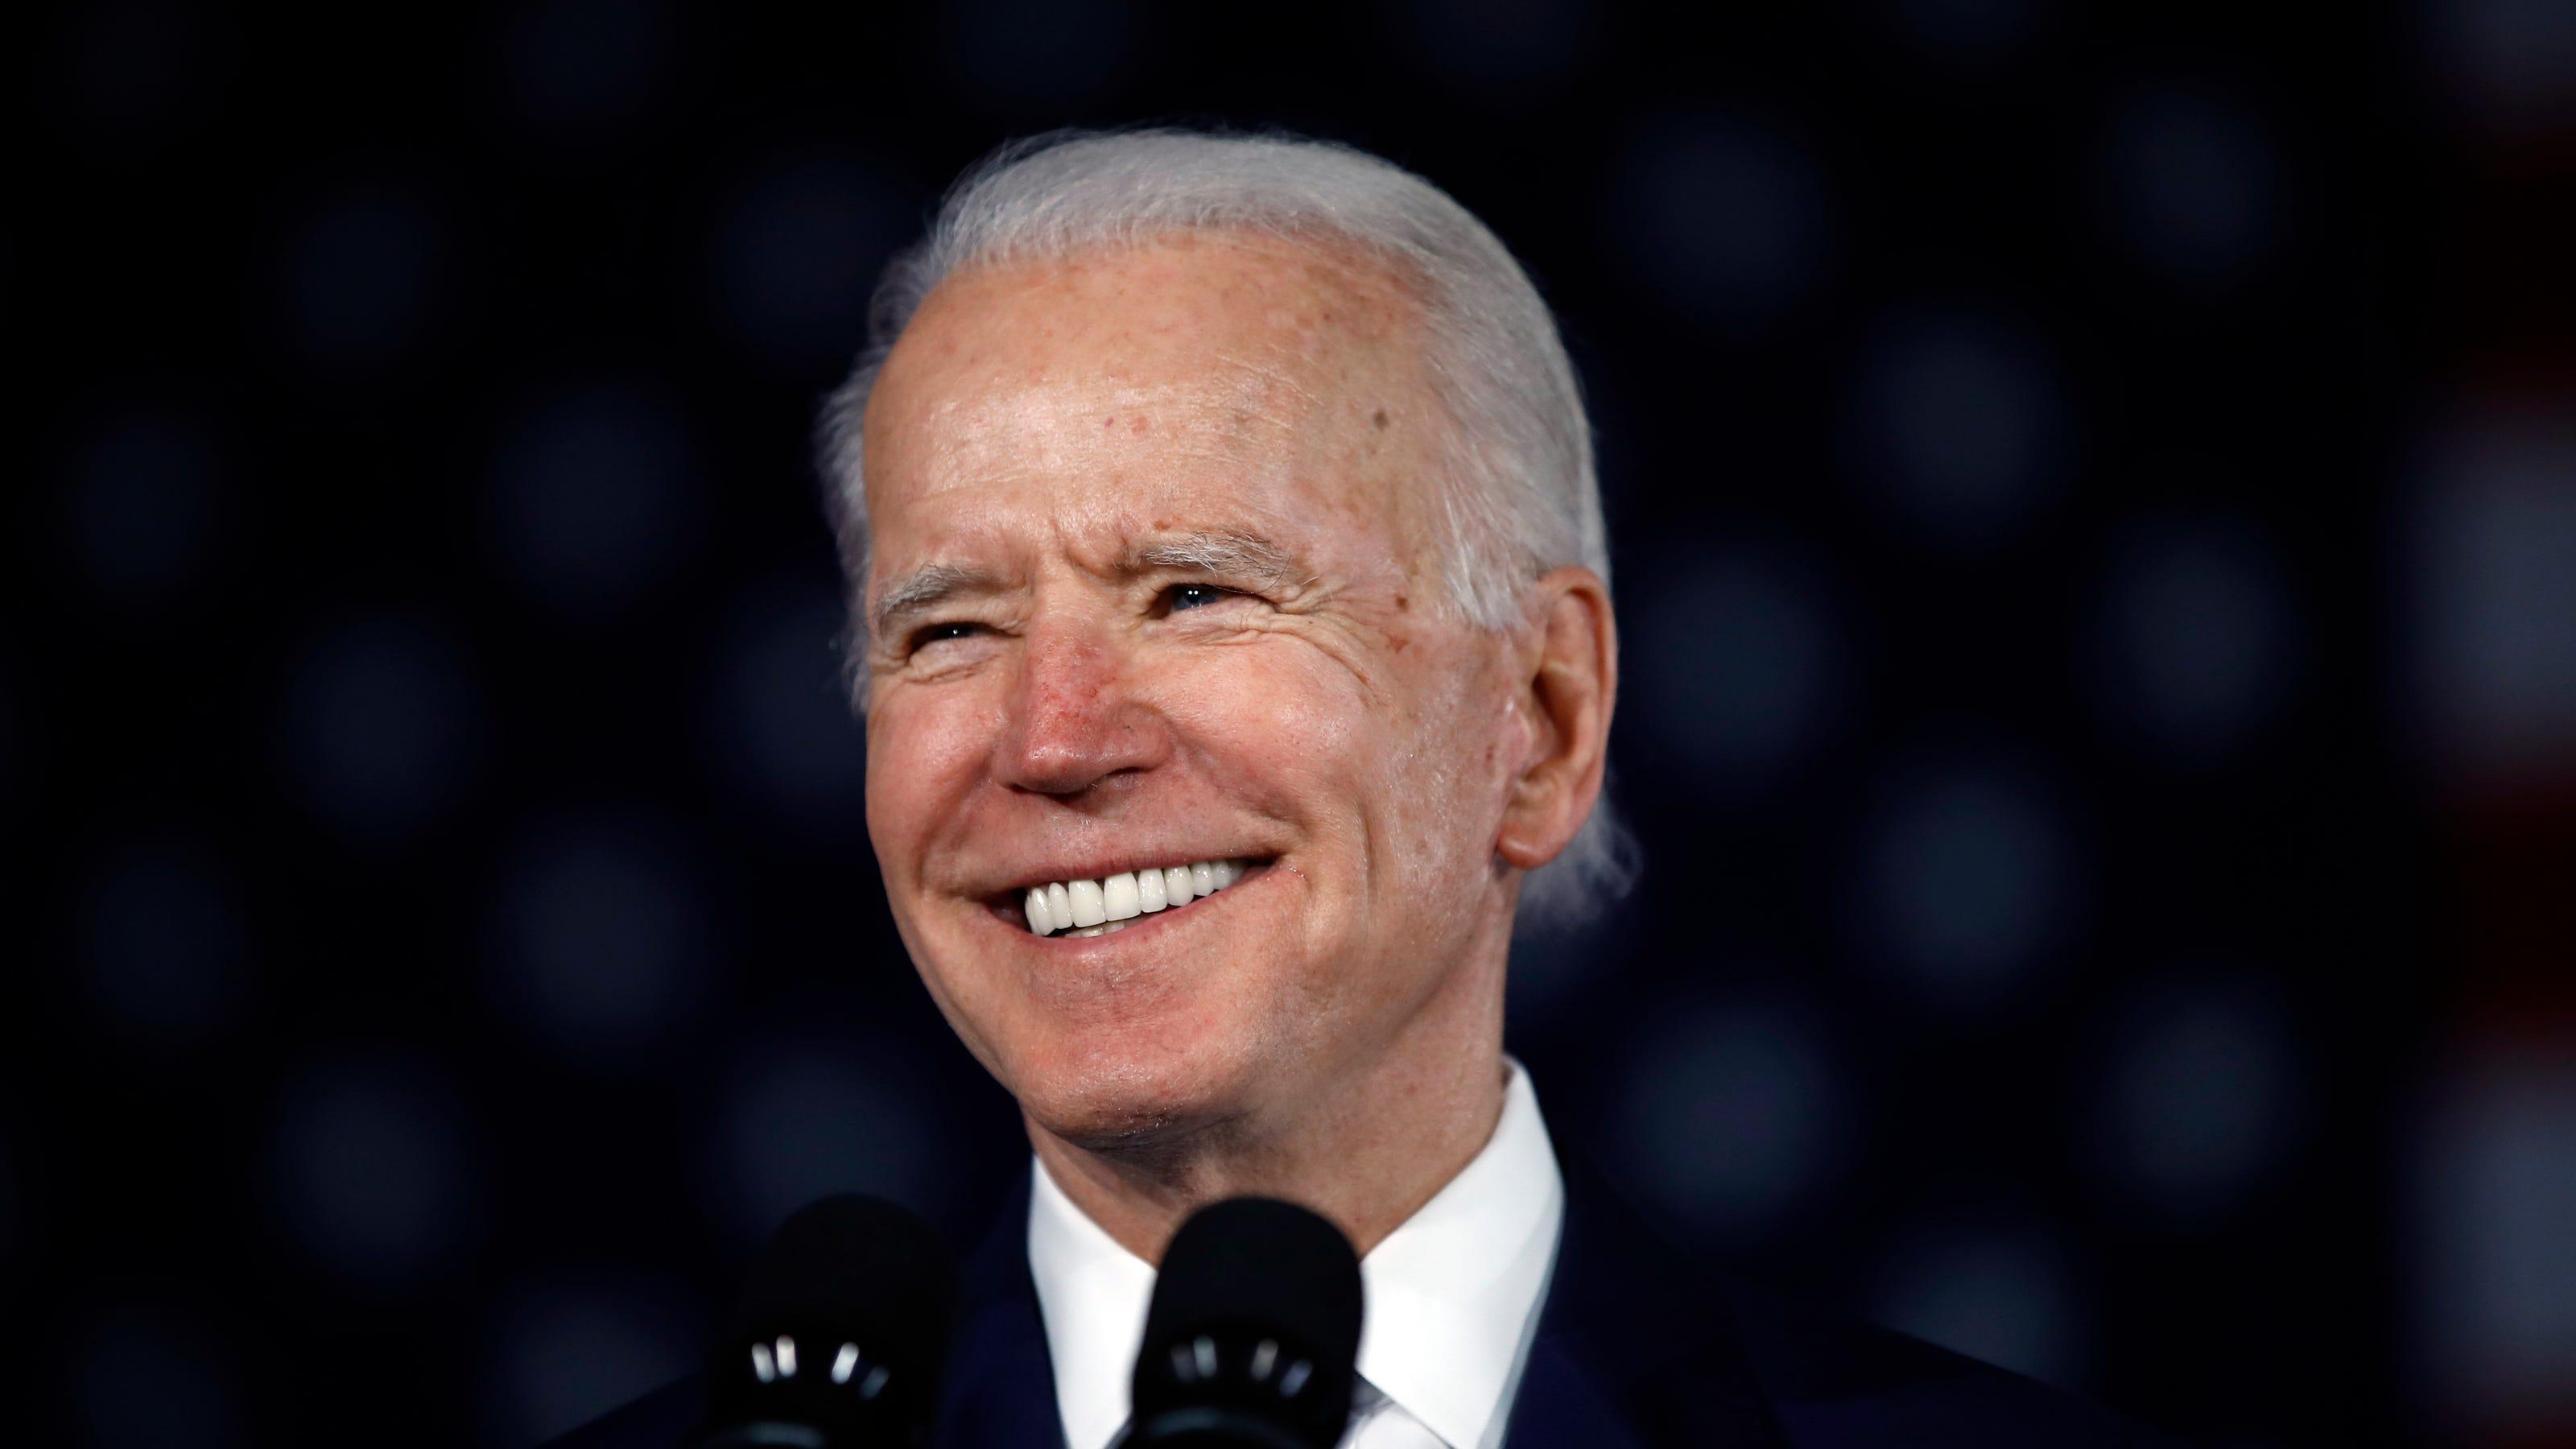 Nationscape Survey Joe Biden Holds An 11 Point Lead Over Donald Trump